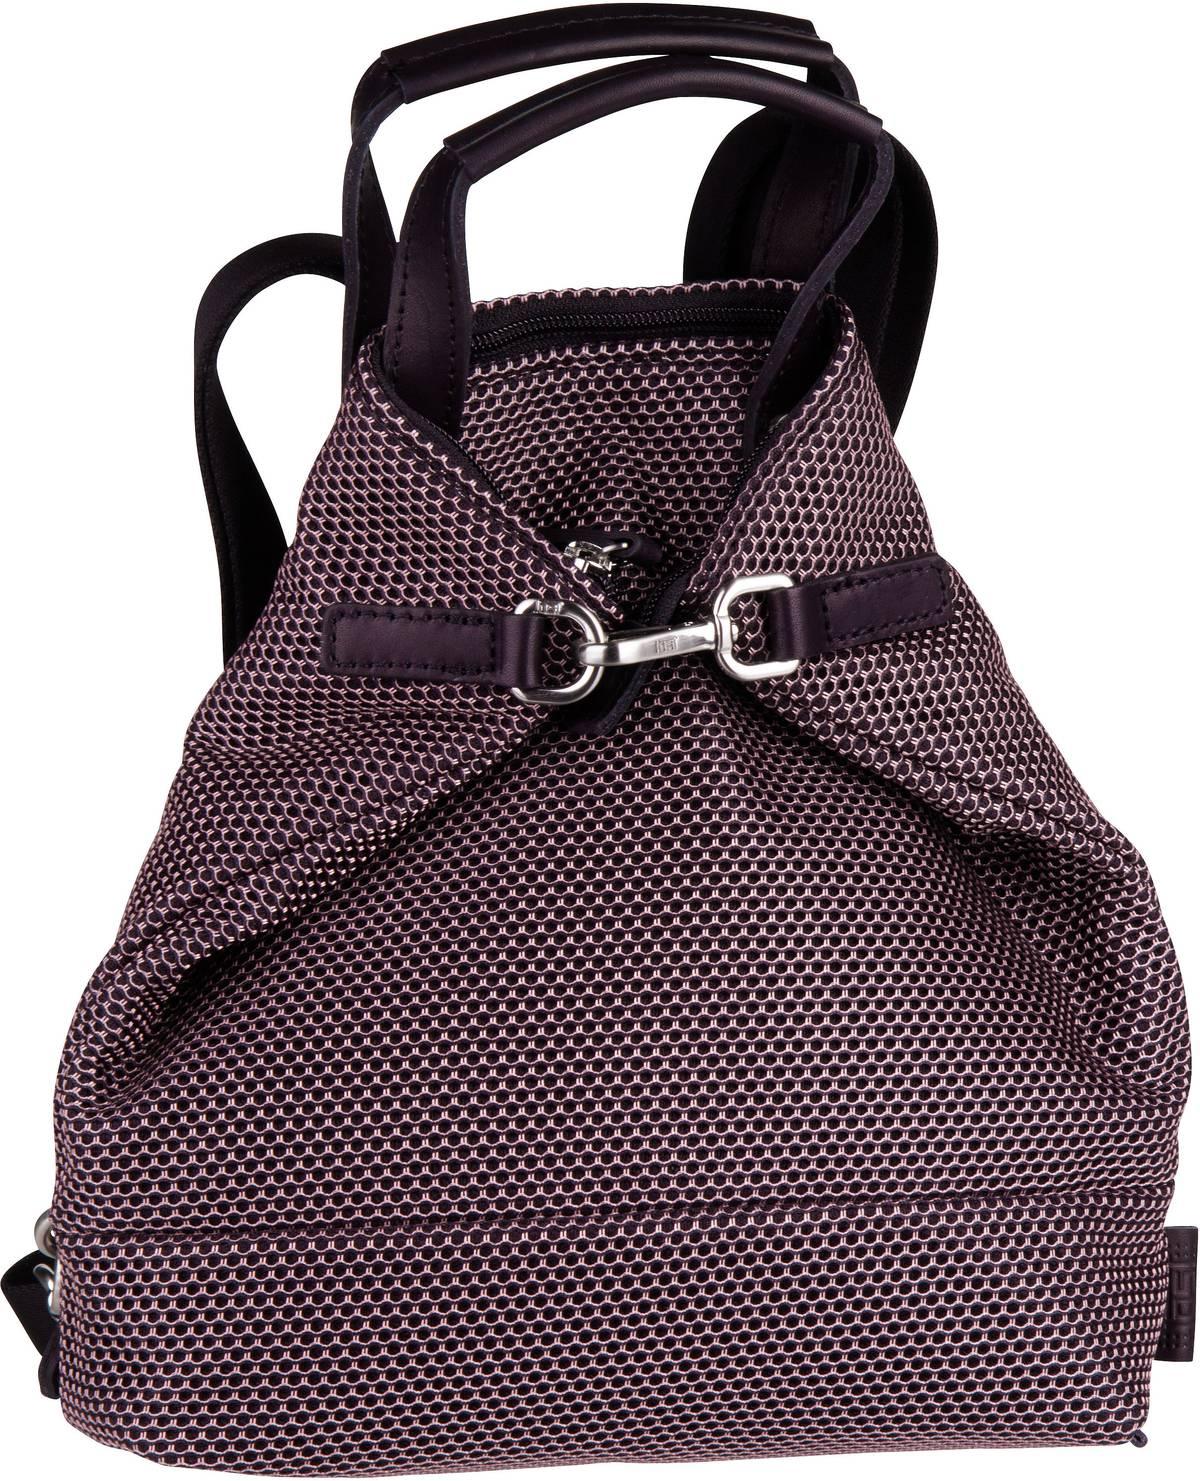 Rucksack / Daypack Mesh 6176 X-Change Bag Mini Rosewood